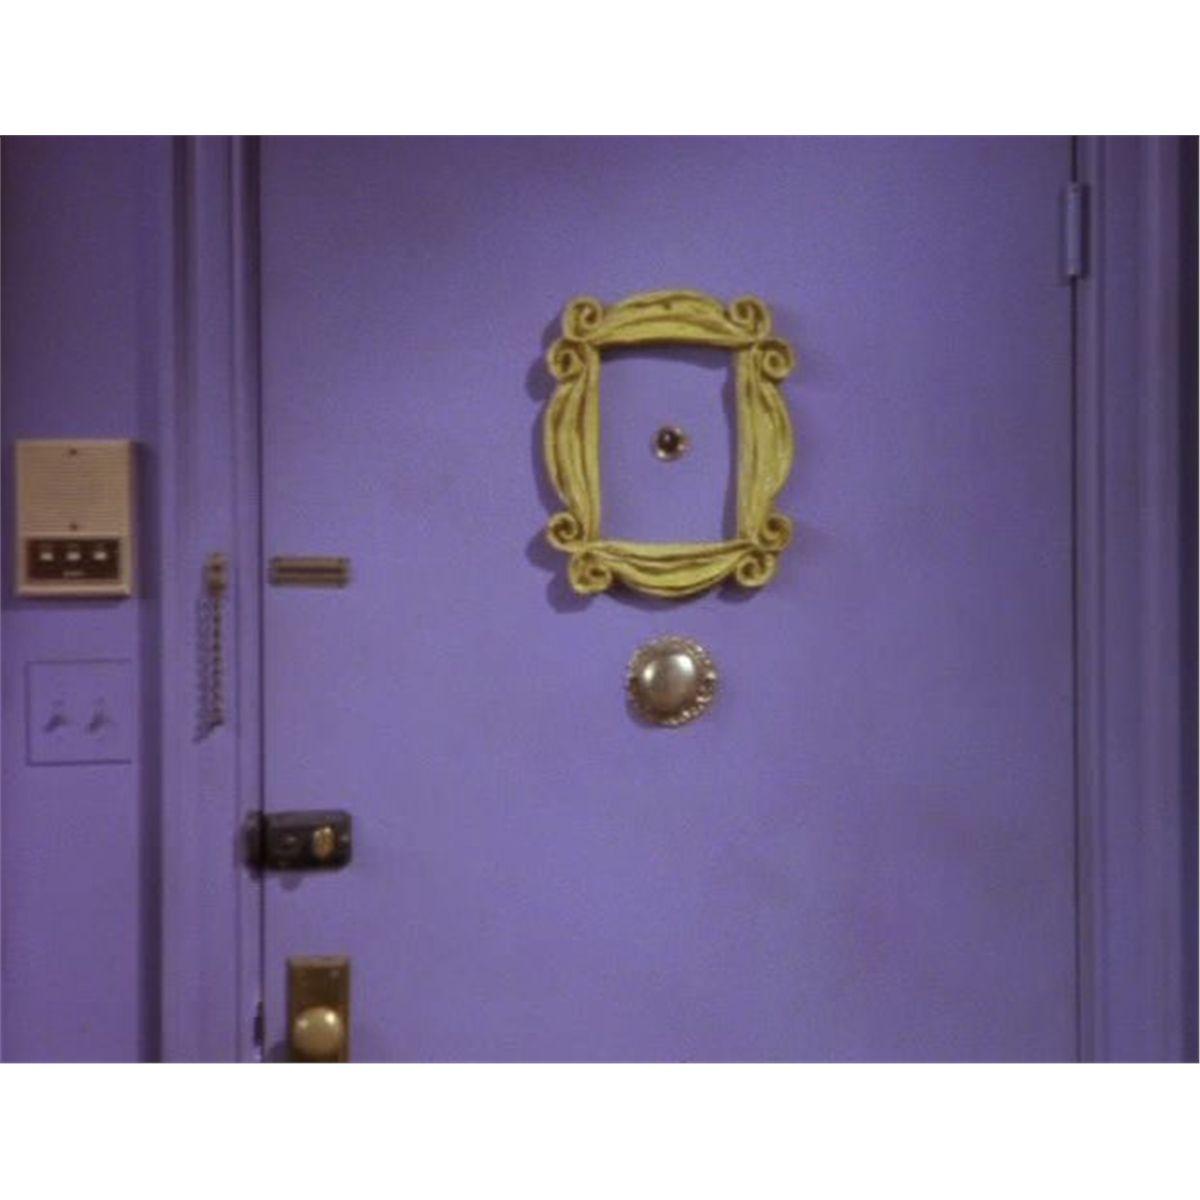 Monicas Peephole Frame - F.R.I.E.N.D.S